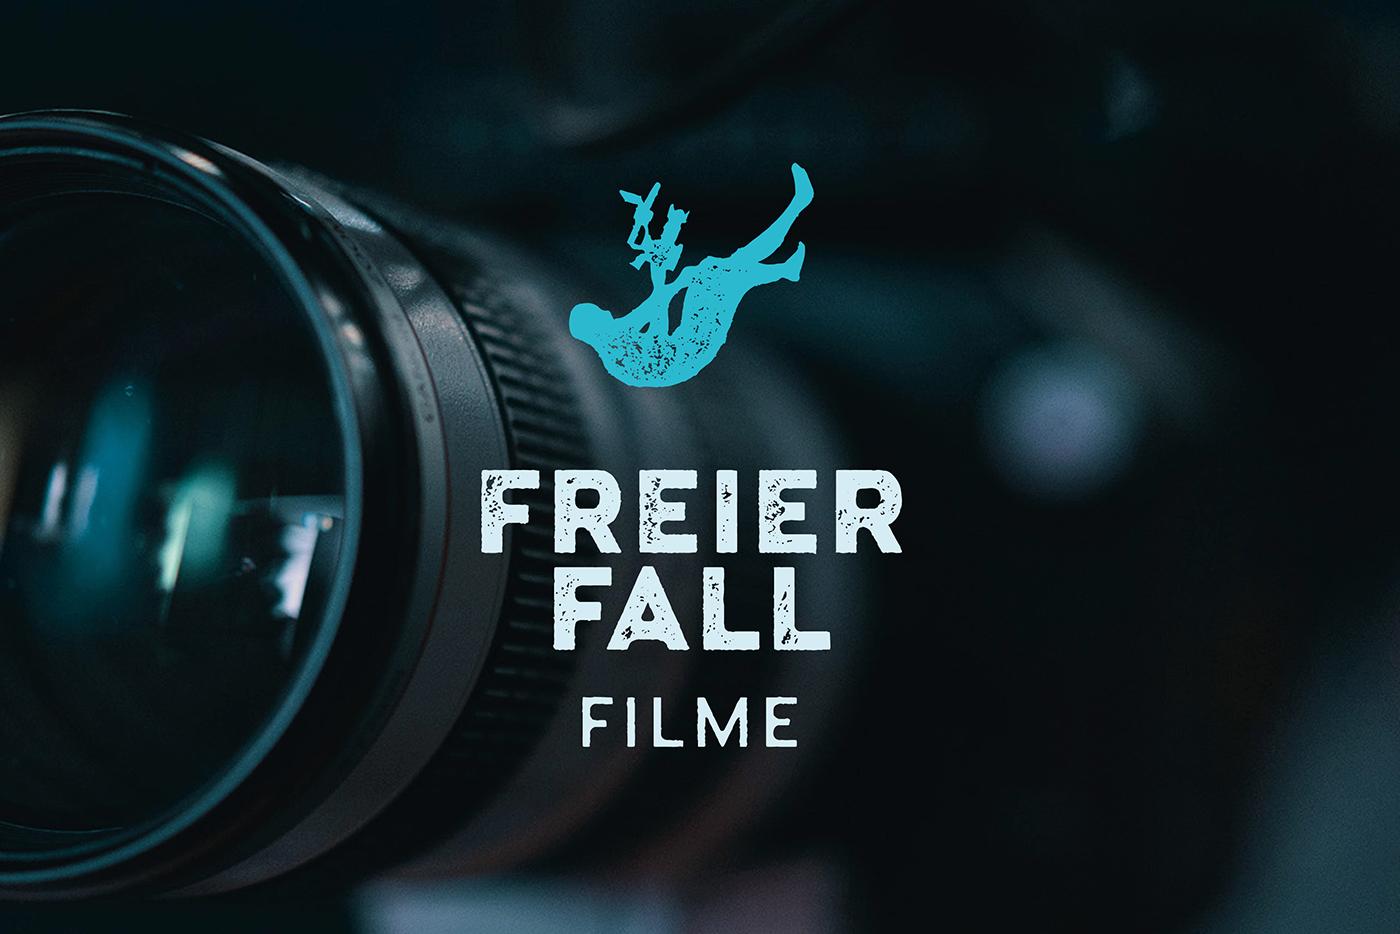 FREIER FALL FILME